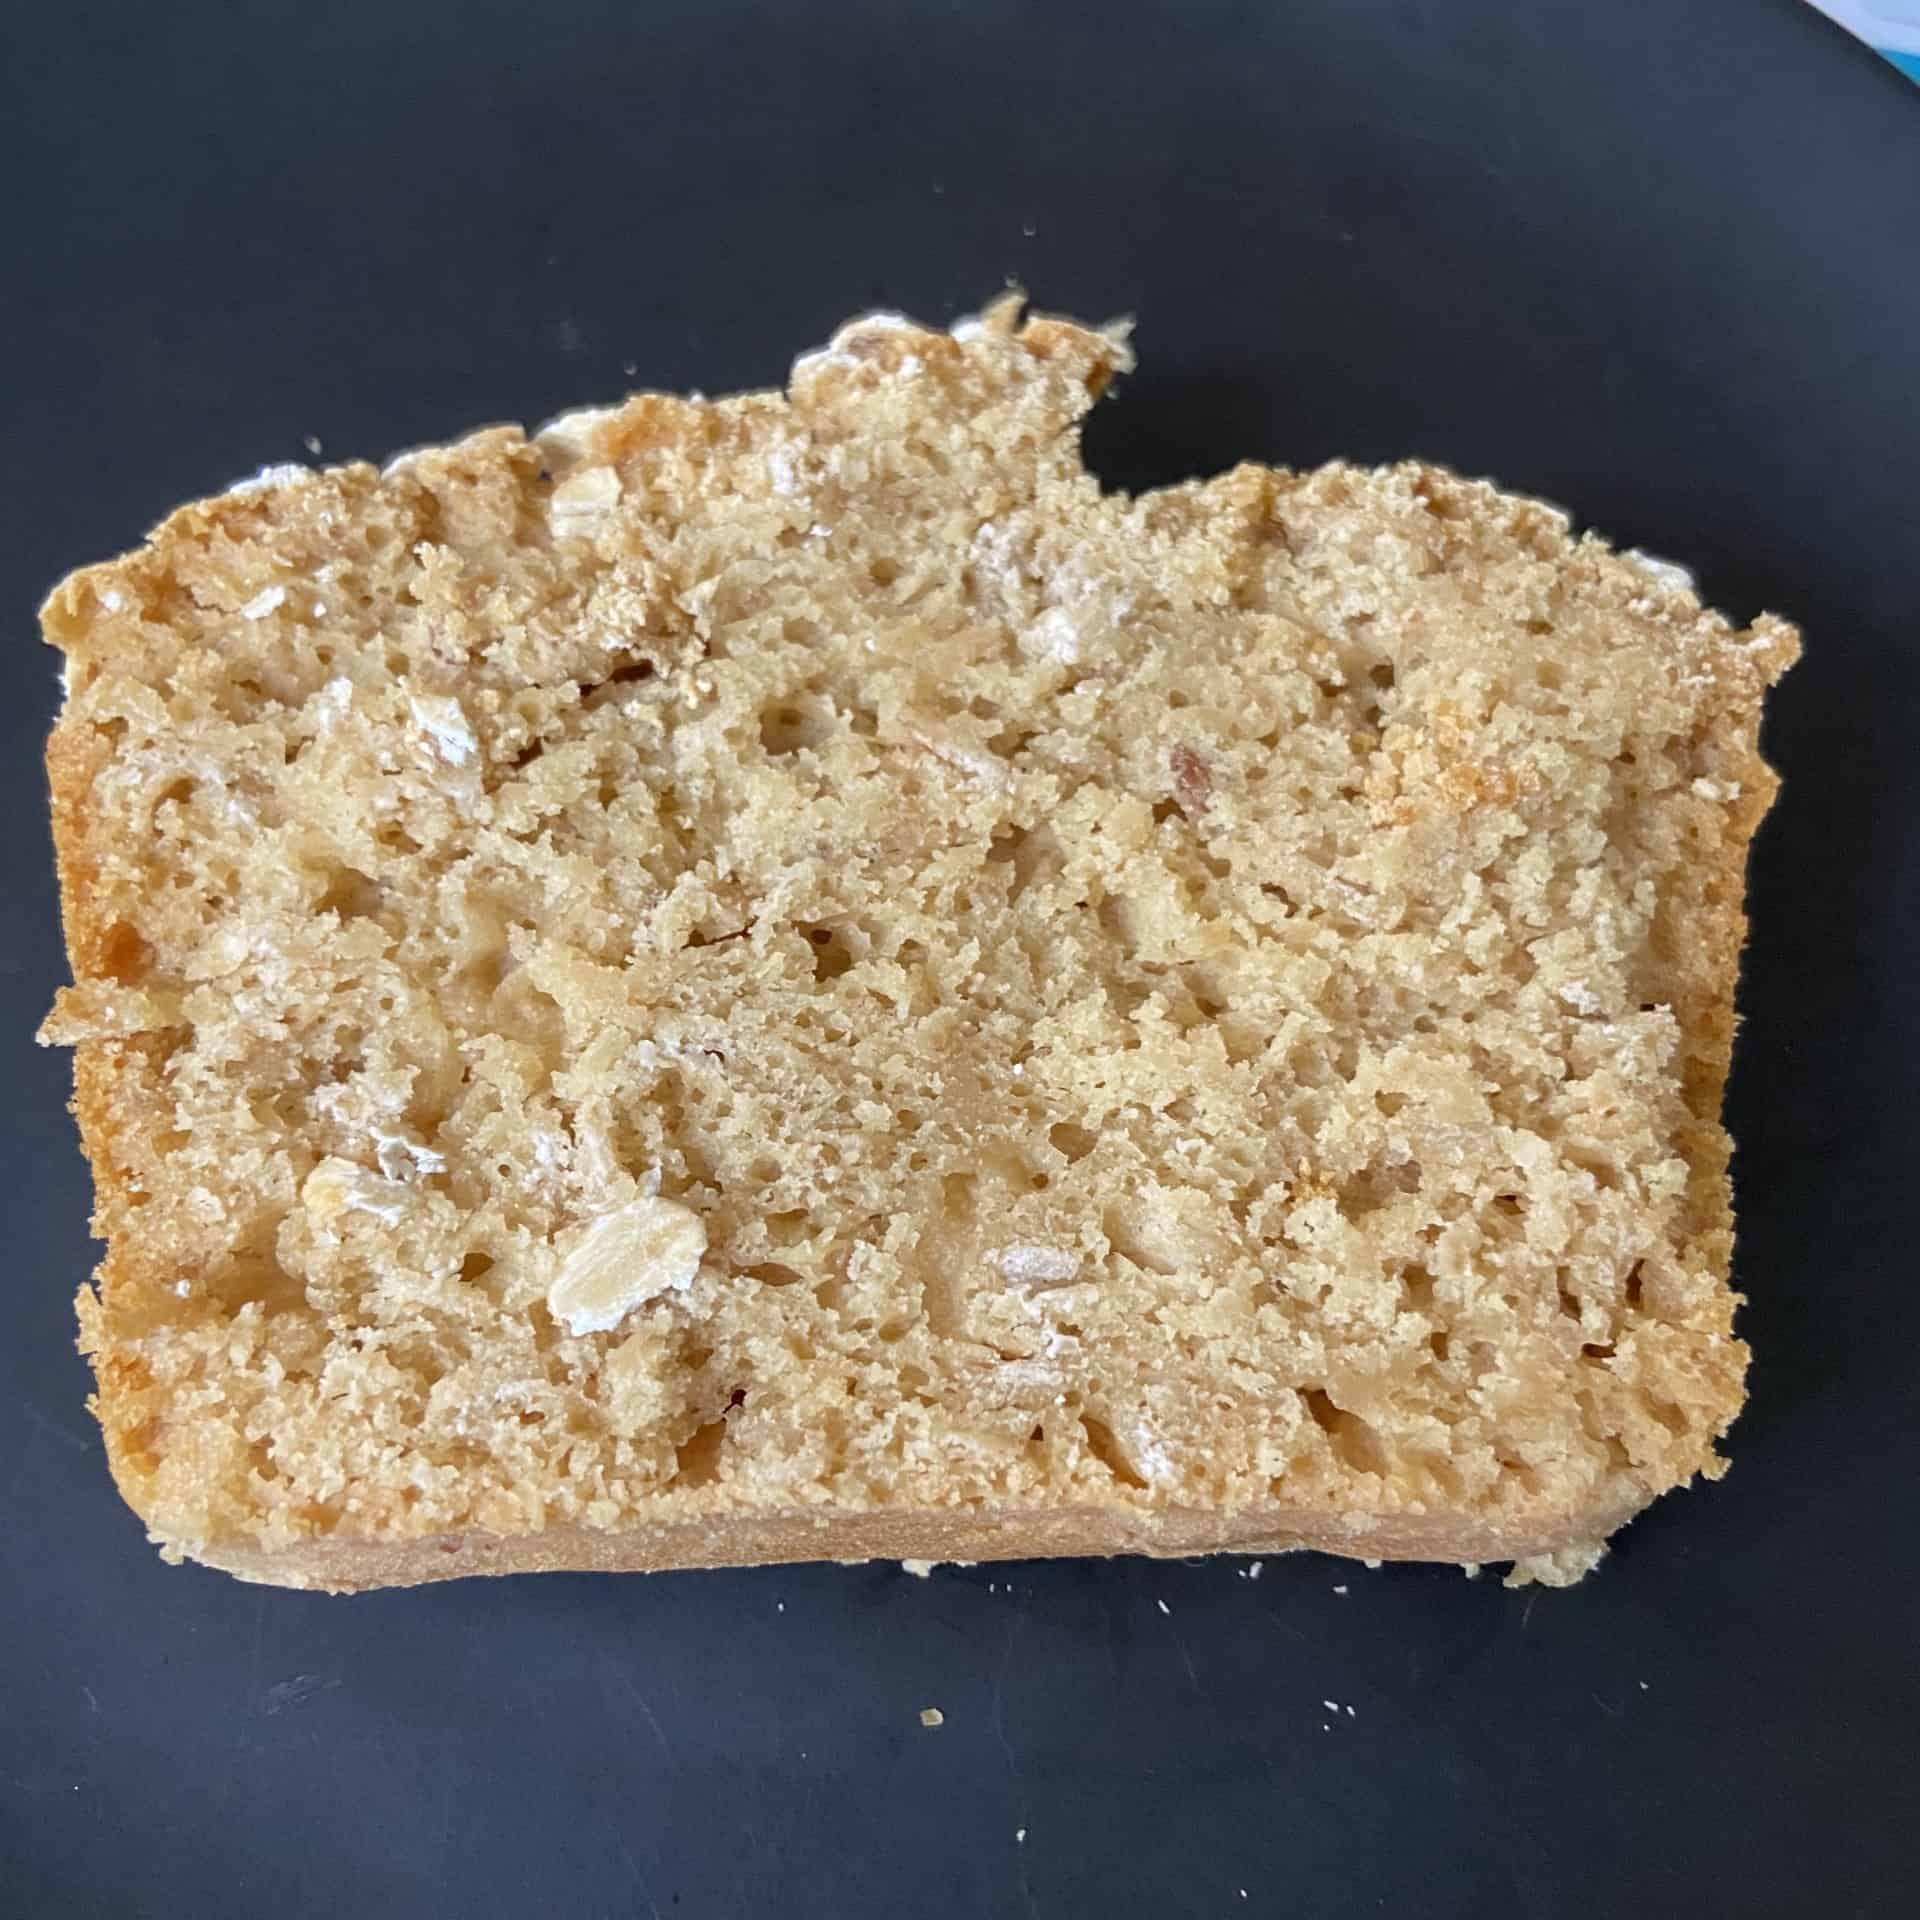 Hafer-Dinkel-Brot ohne Hefe mit Backpulver